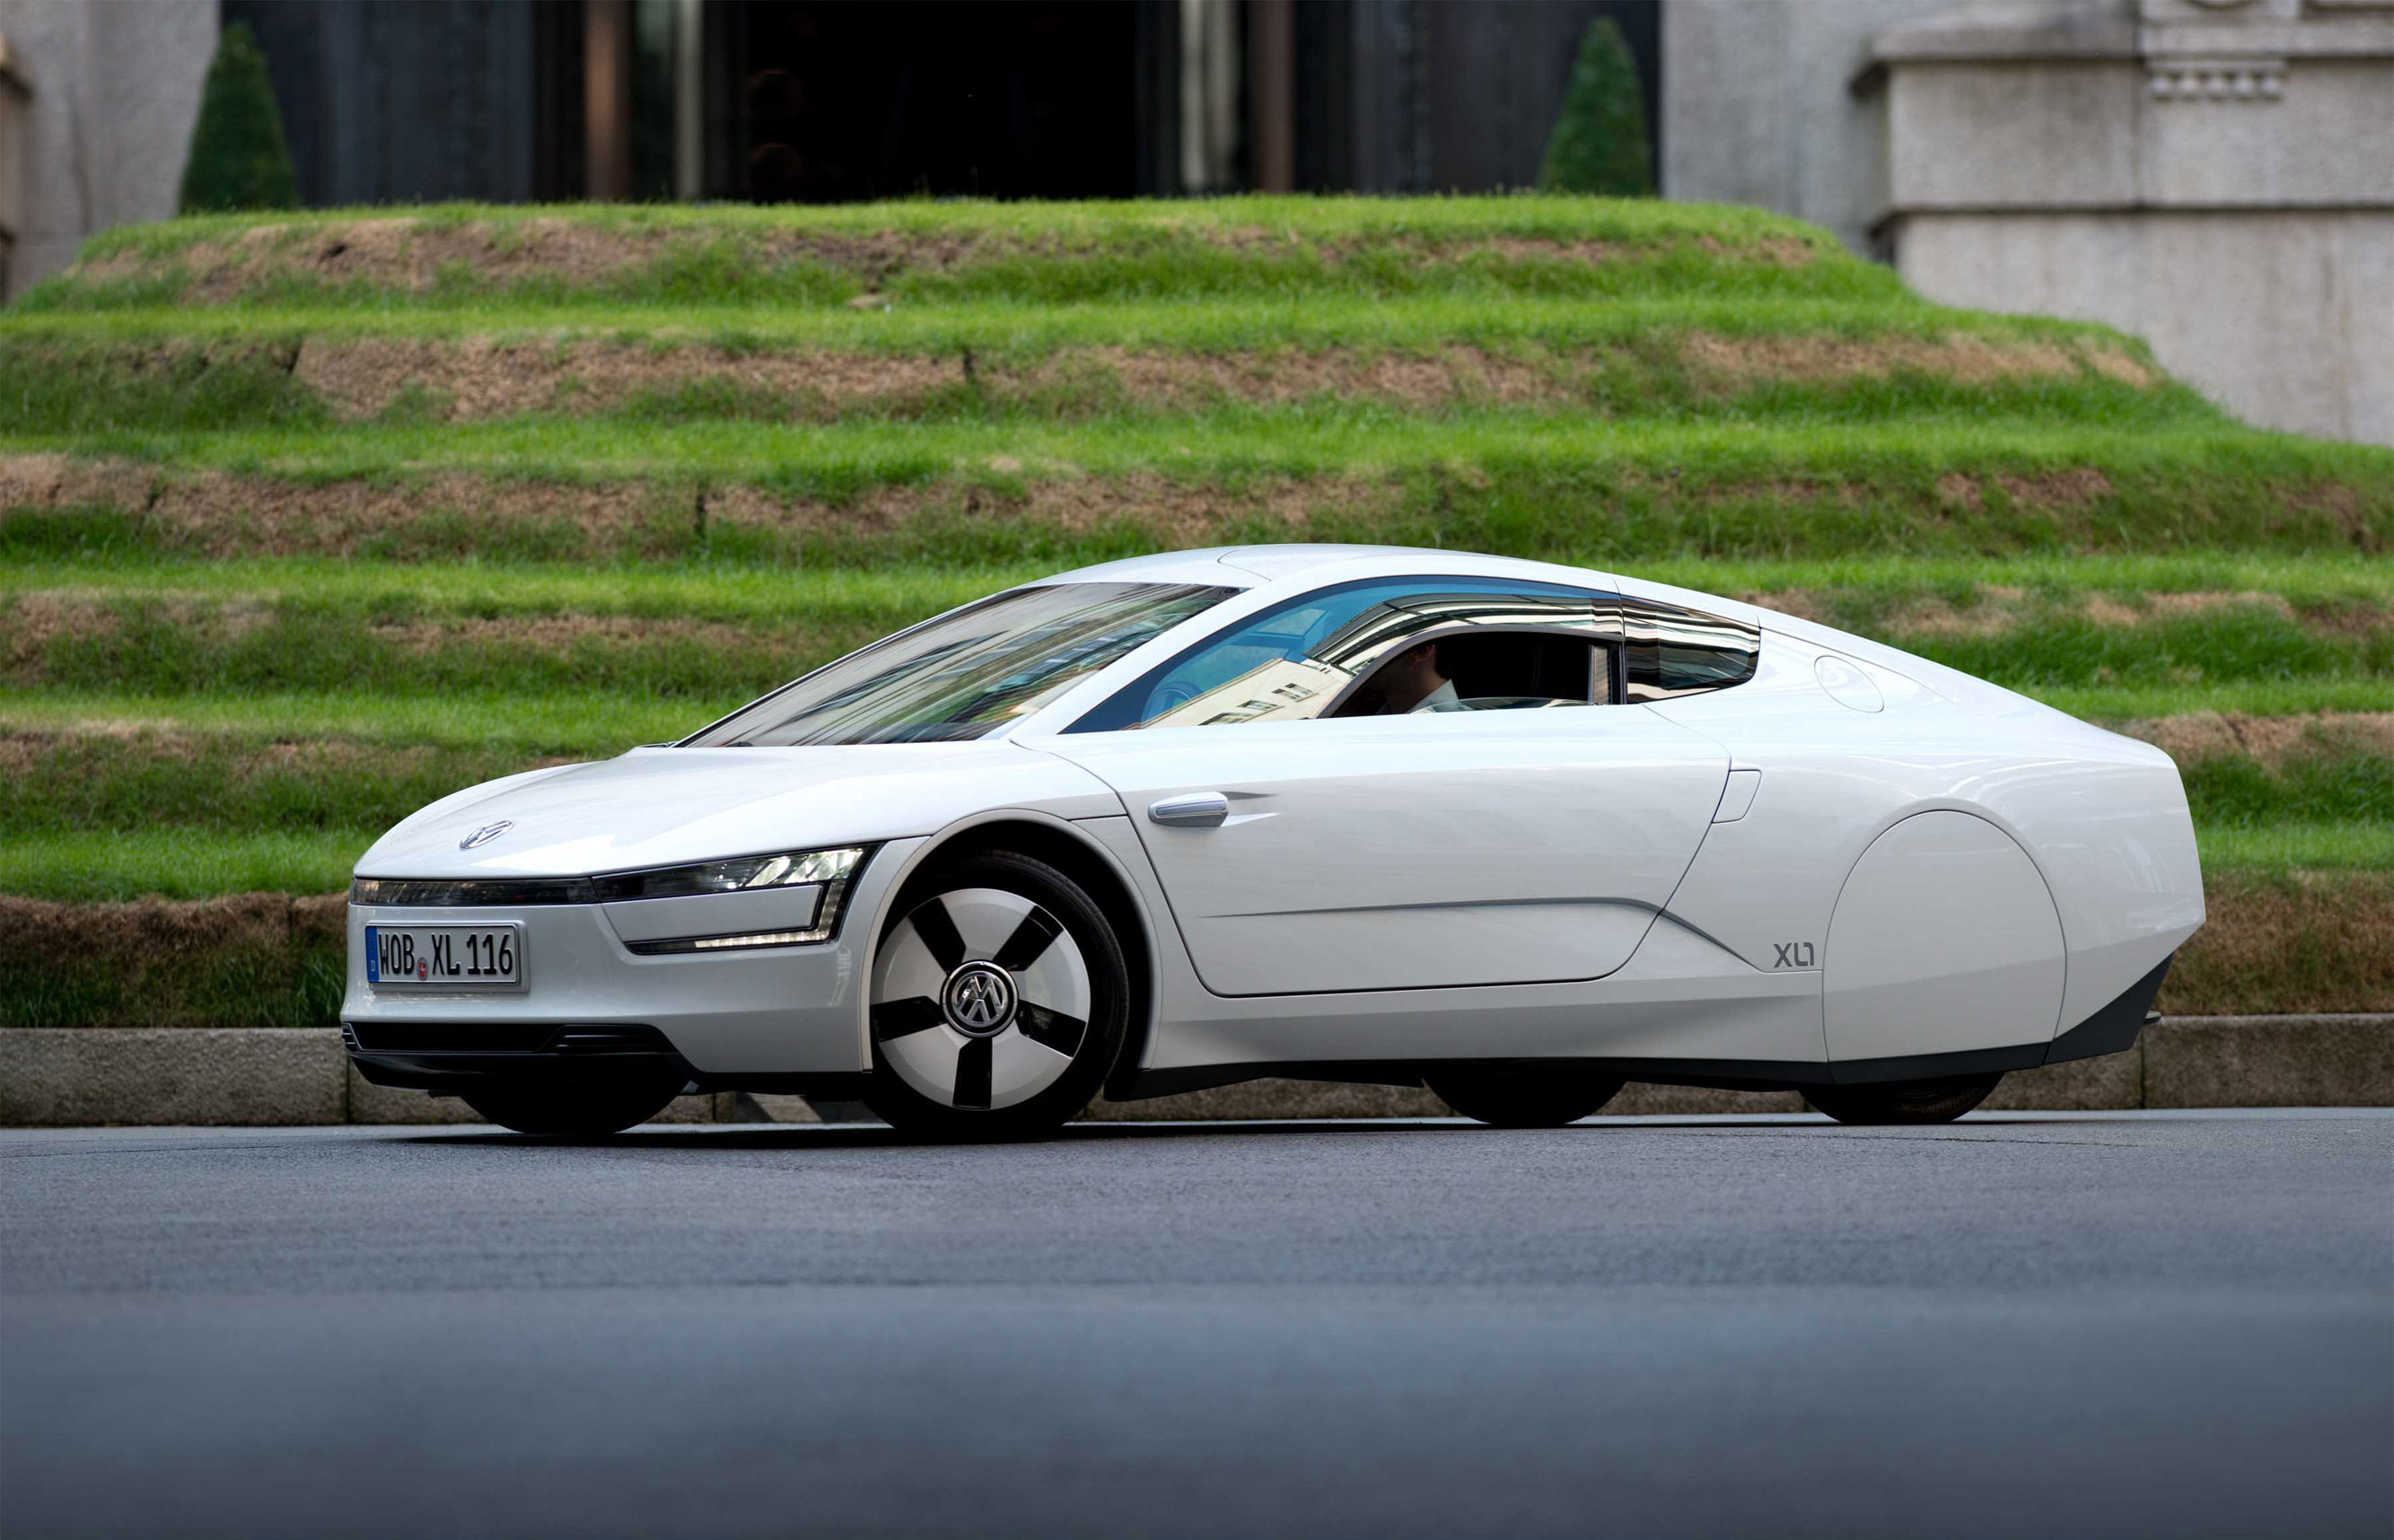 Volkswagen XL1 in London - 0.9 l per 100 km